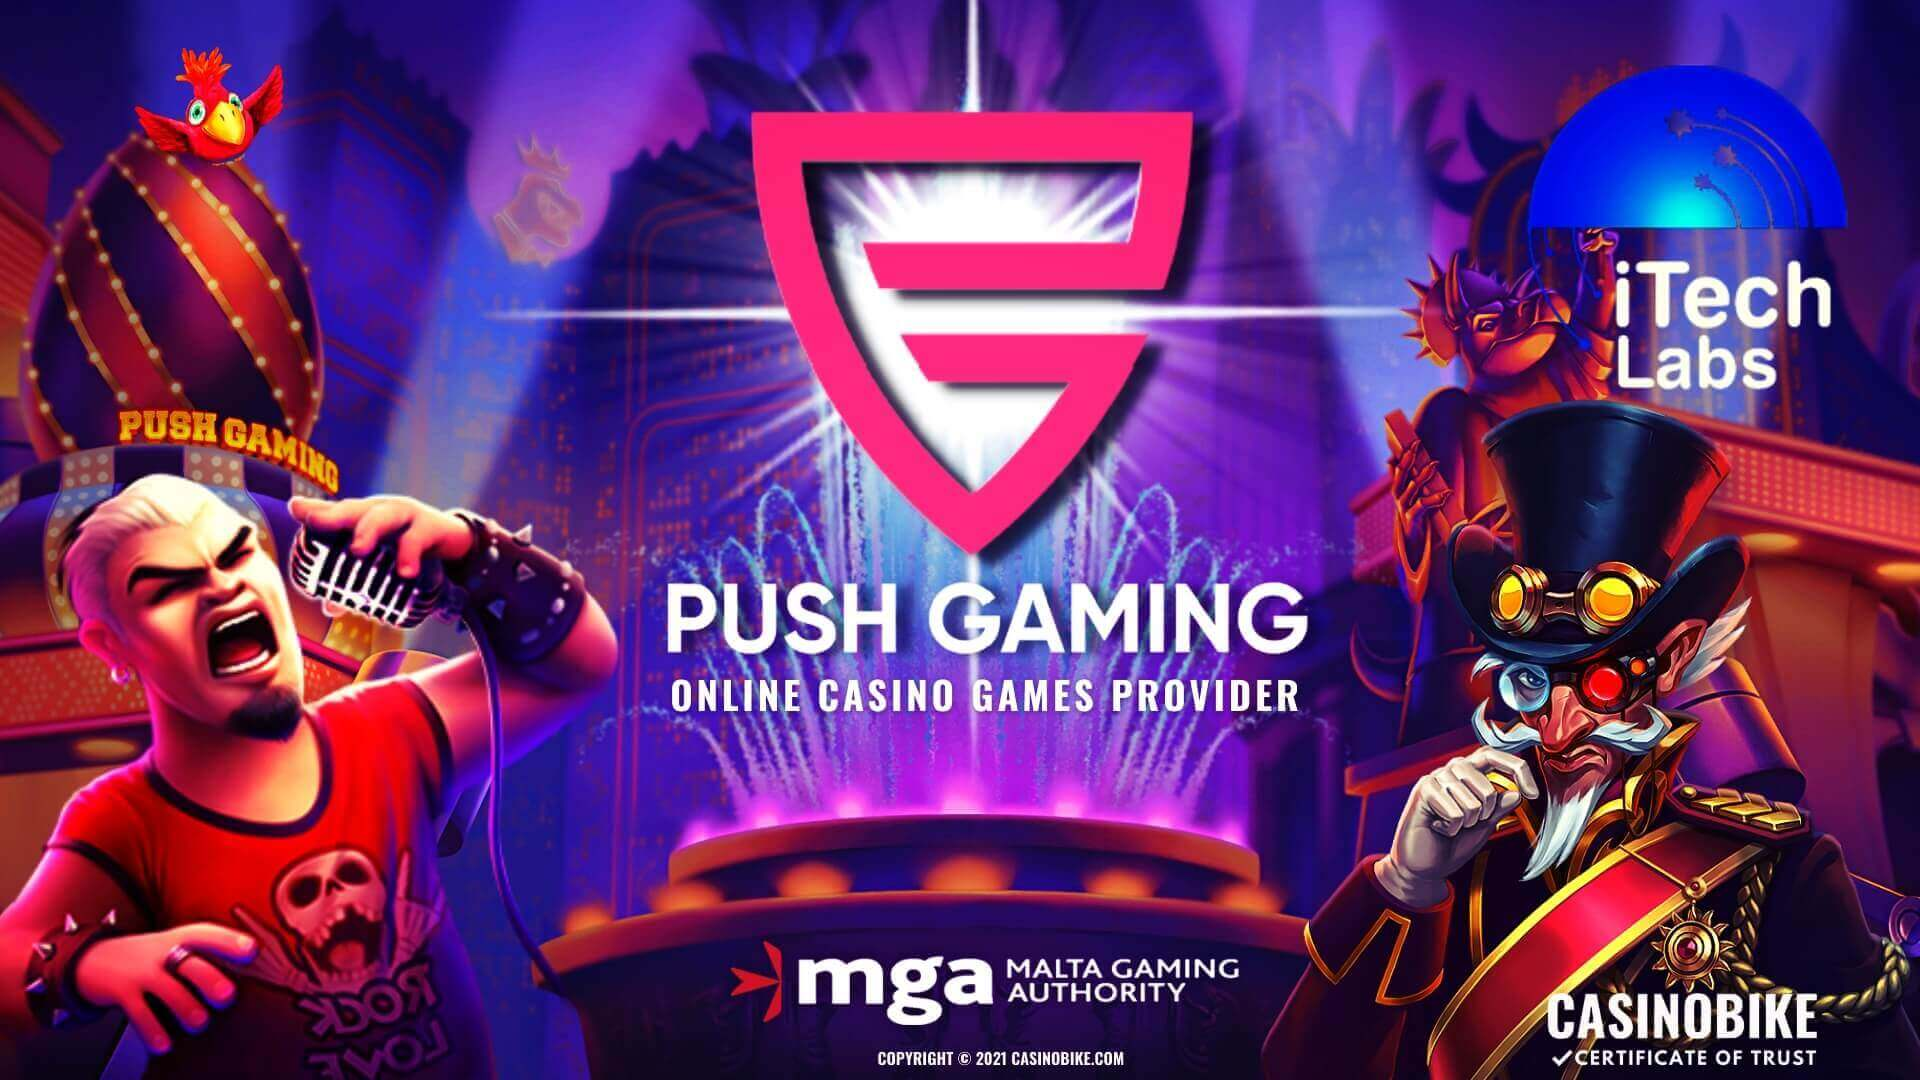 Push Gaming Online Casino Slots Provider